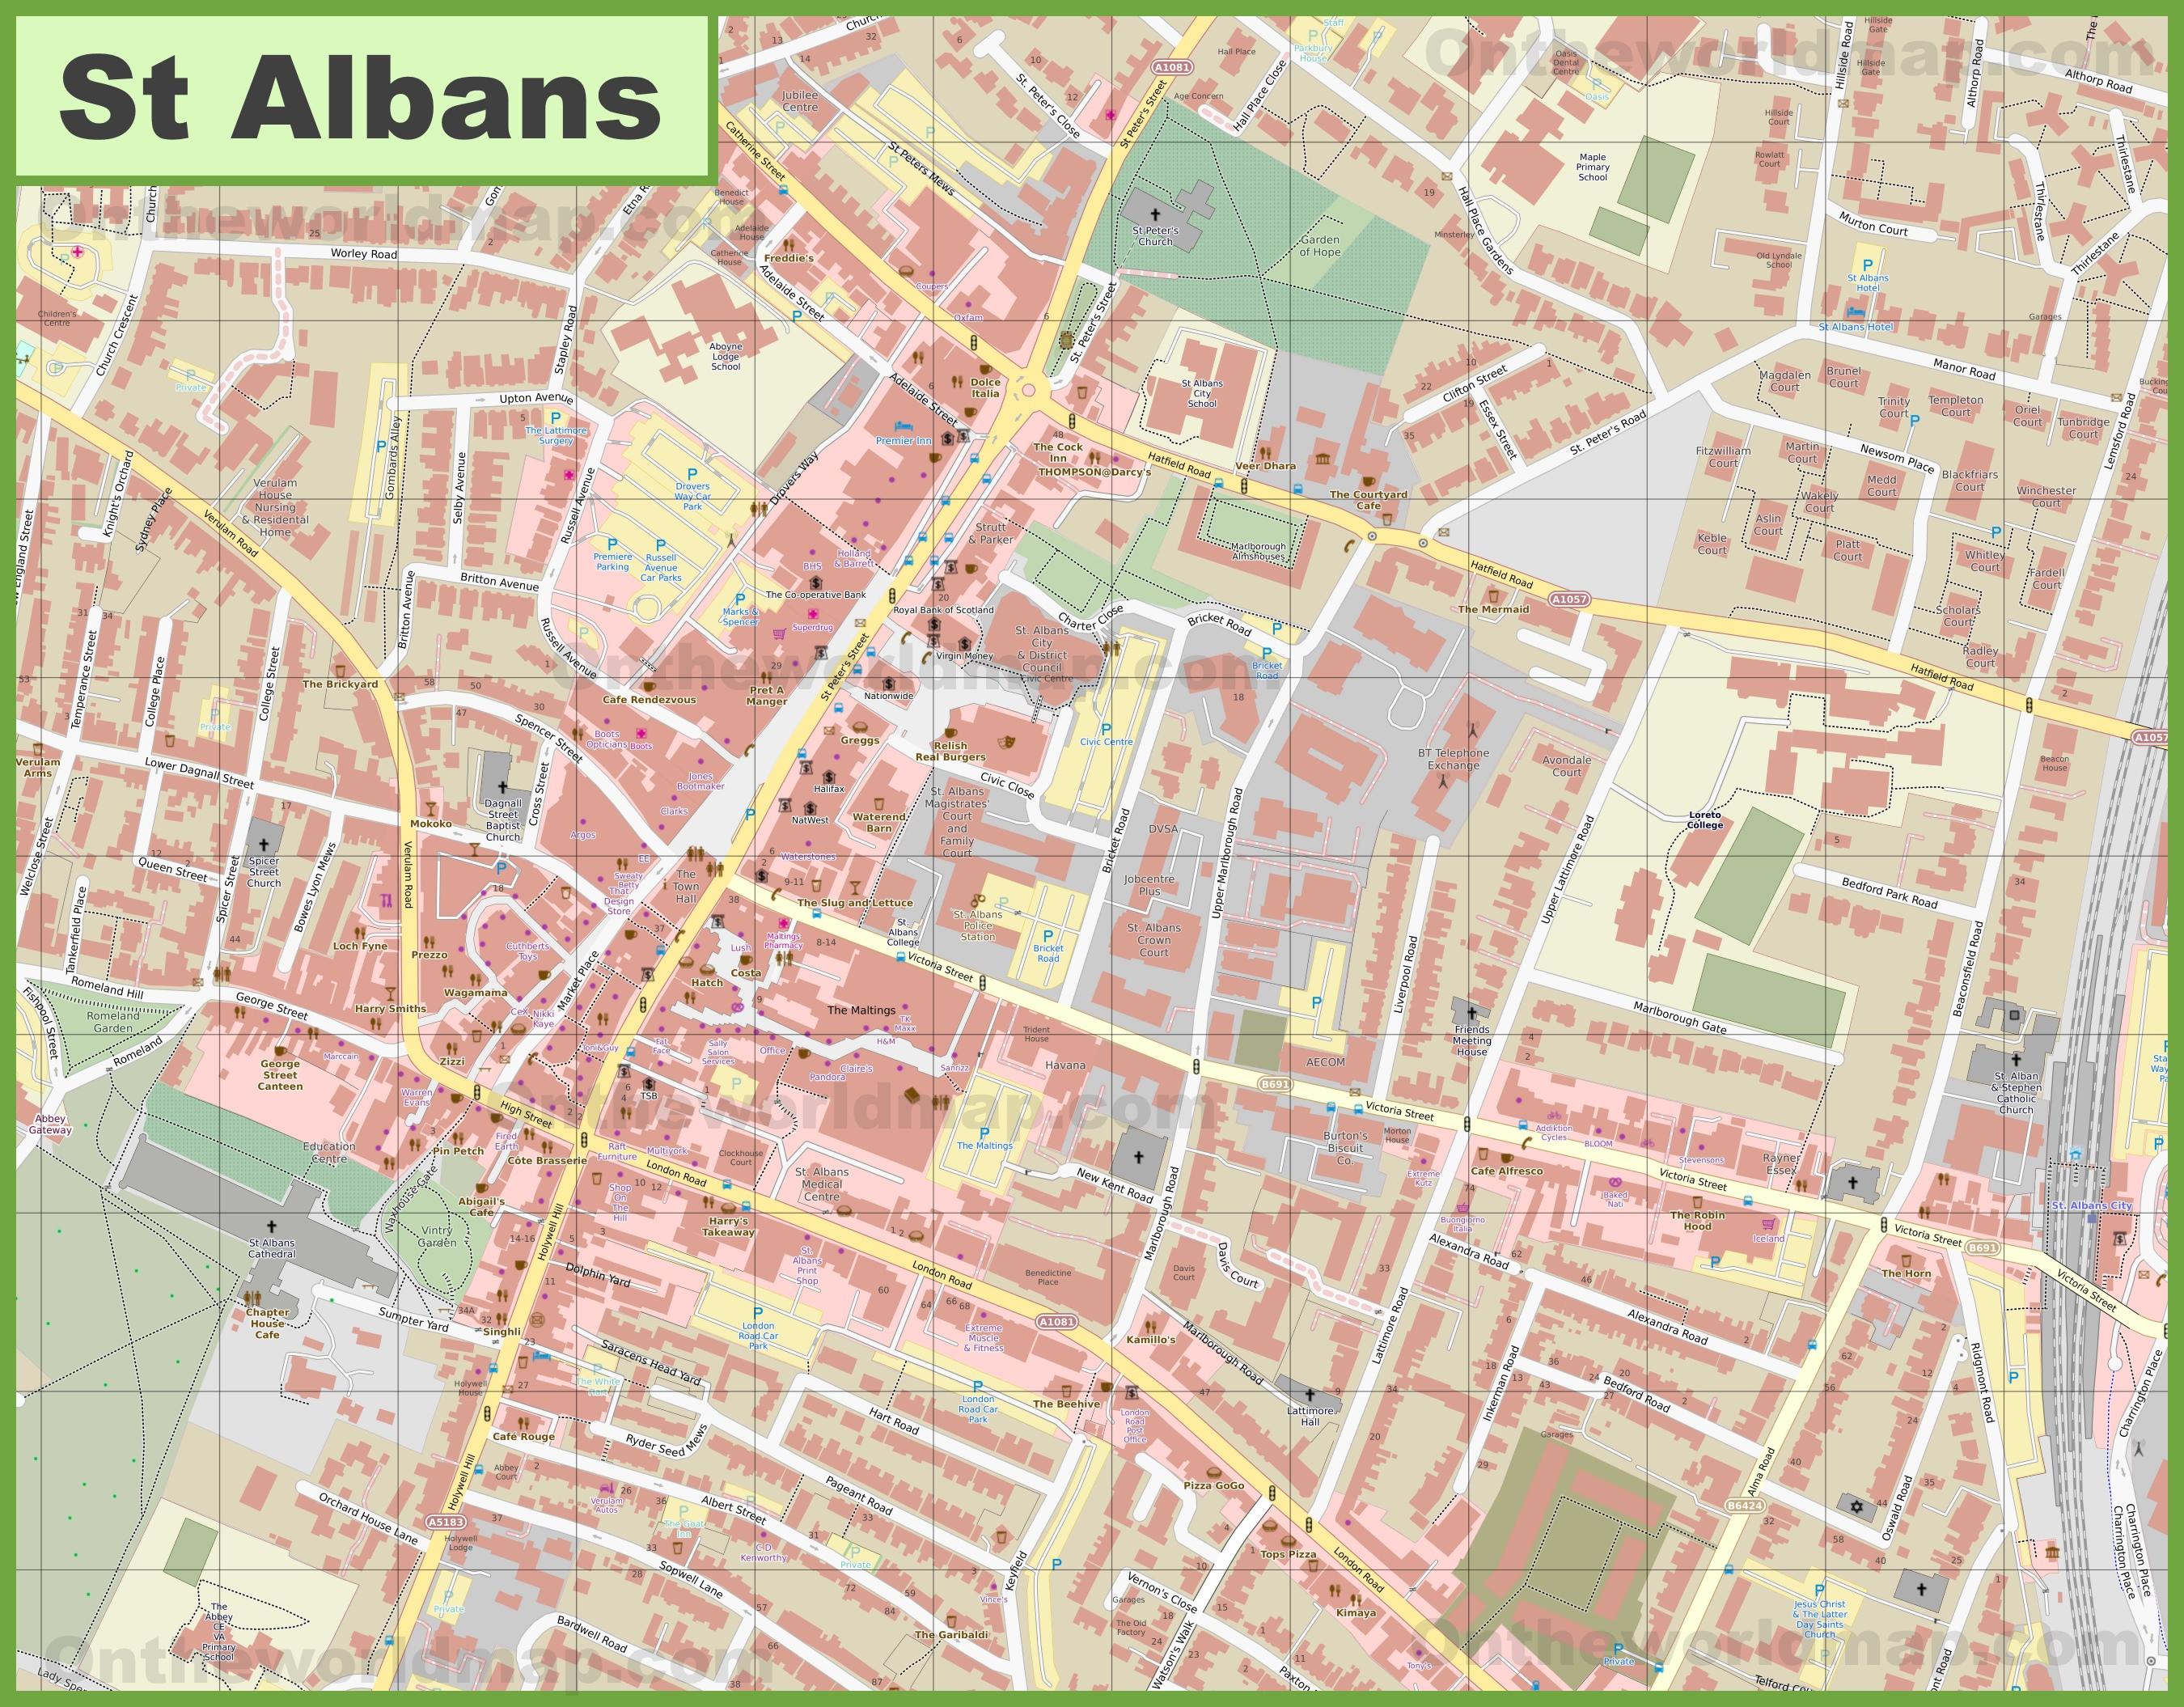 St Albans city center map